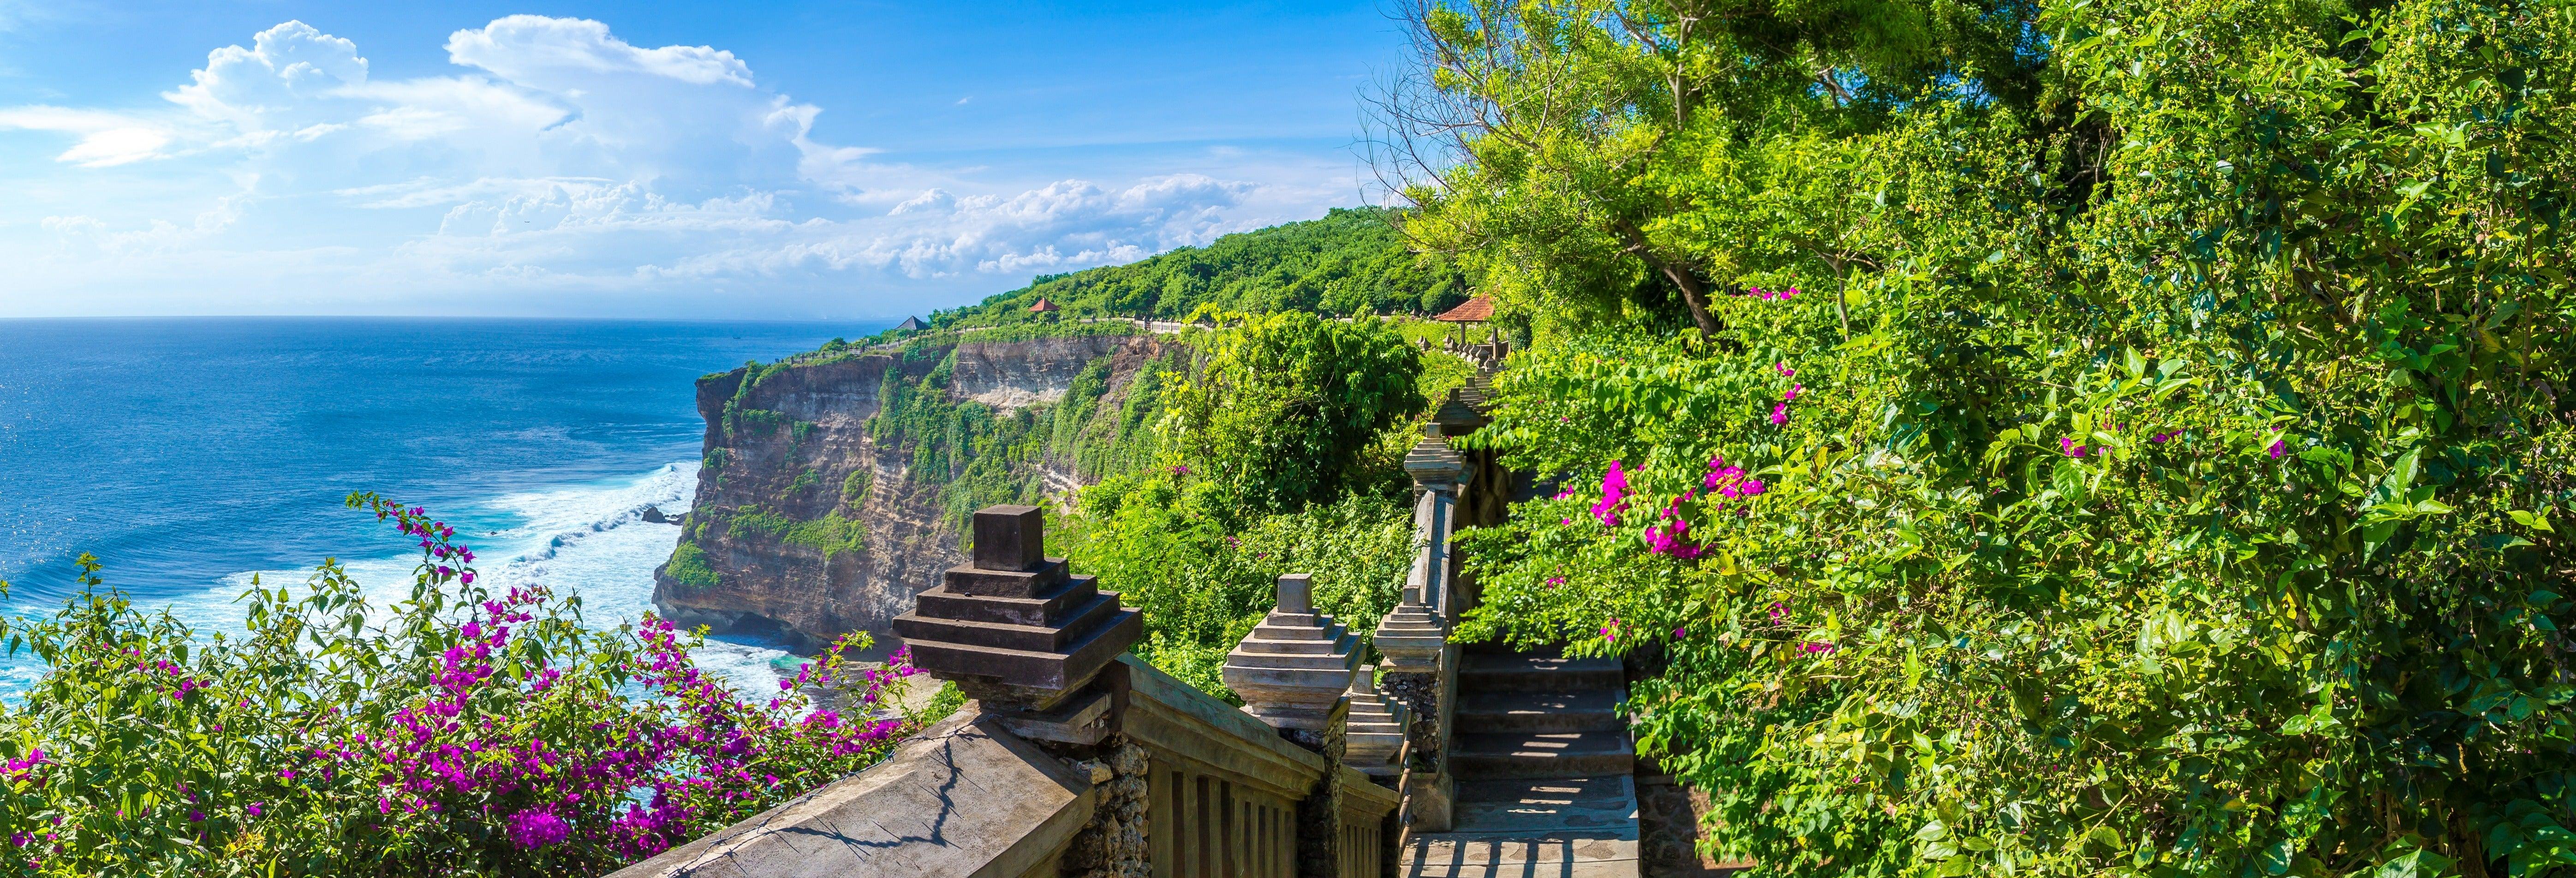 Excursion privée au sud de Bali, au temple d'Uluwatu et à Jimbaran